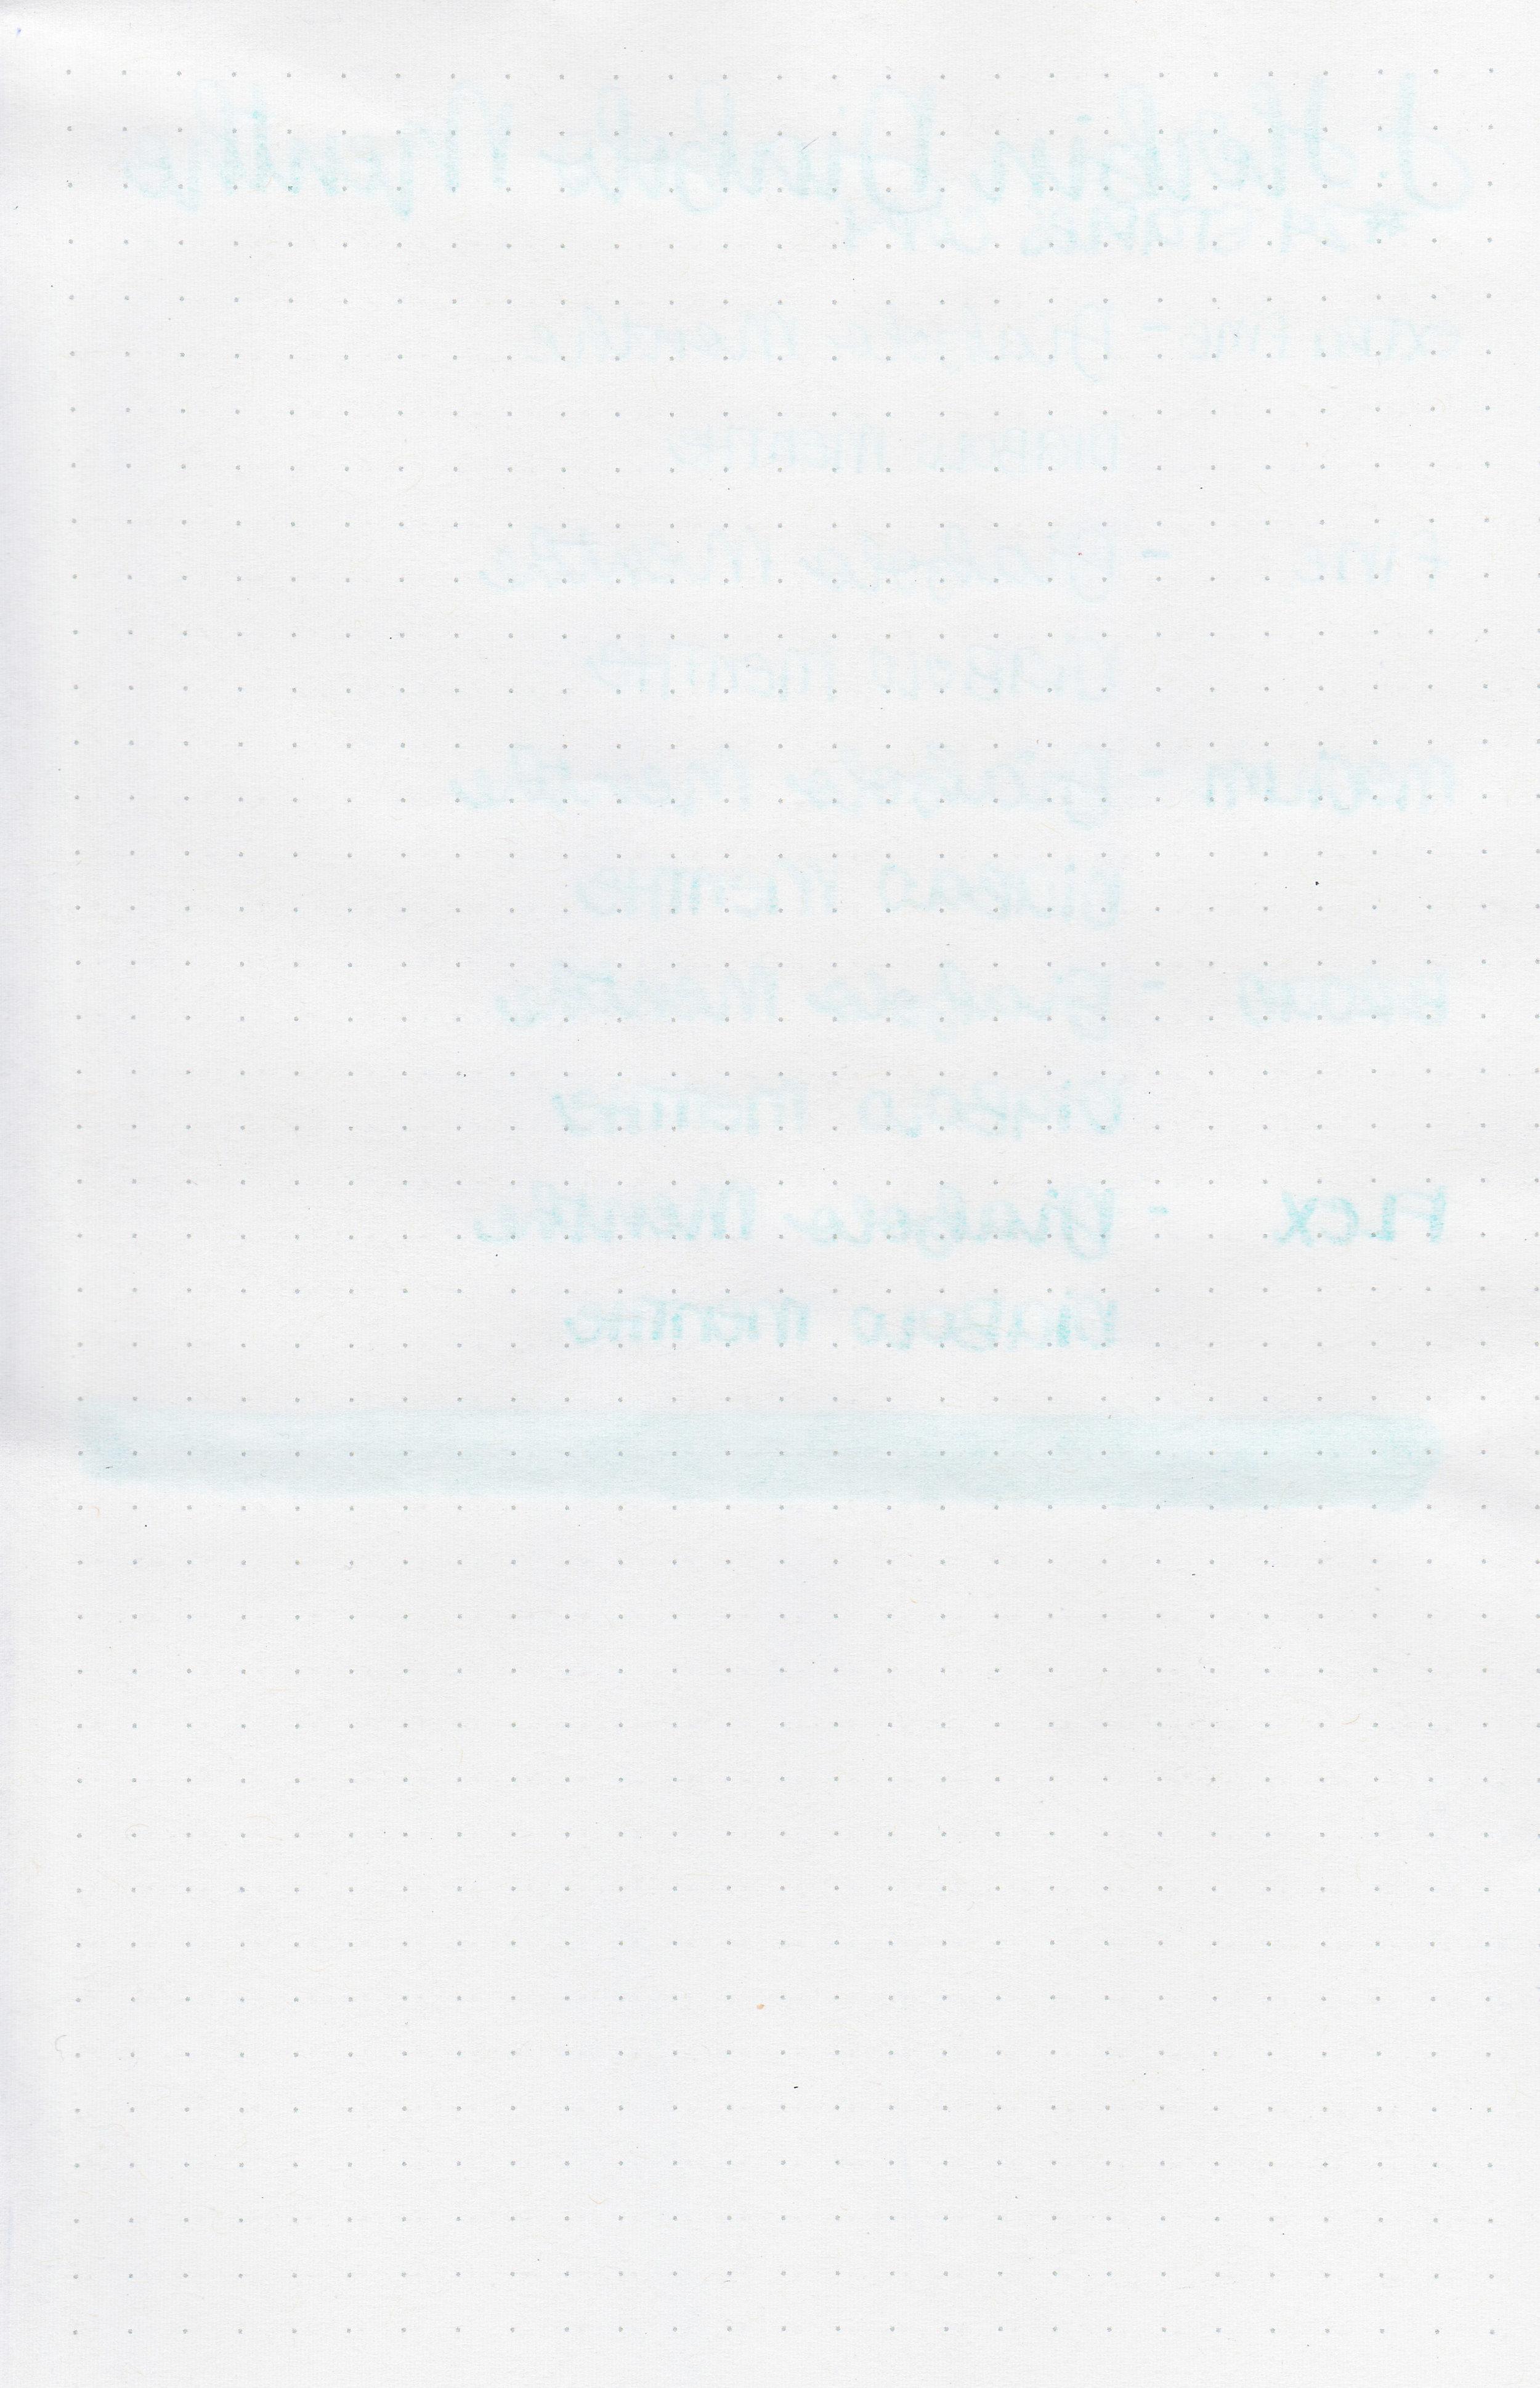 jh-diabolo-menthe-12.jpg